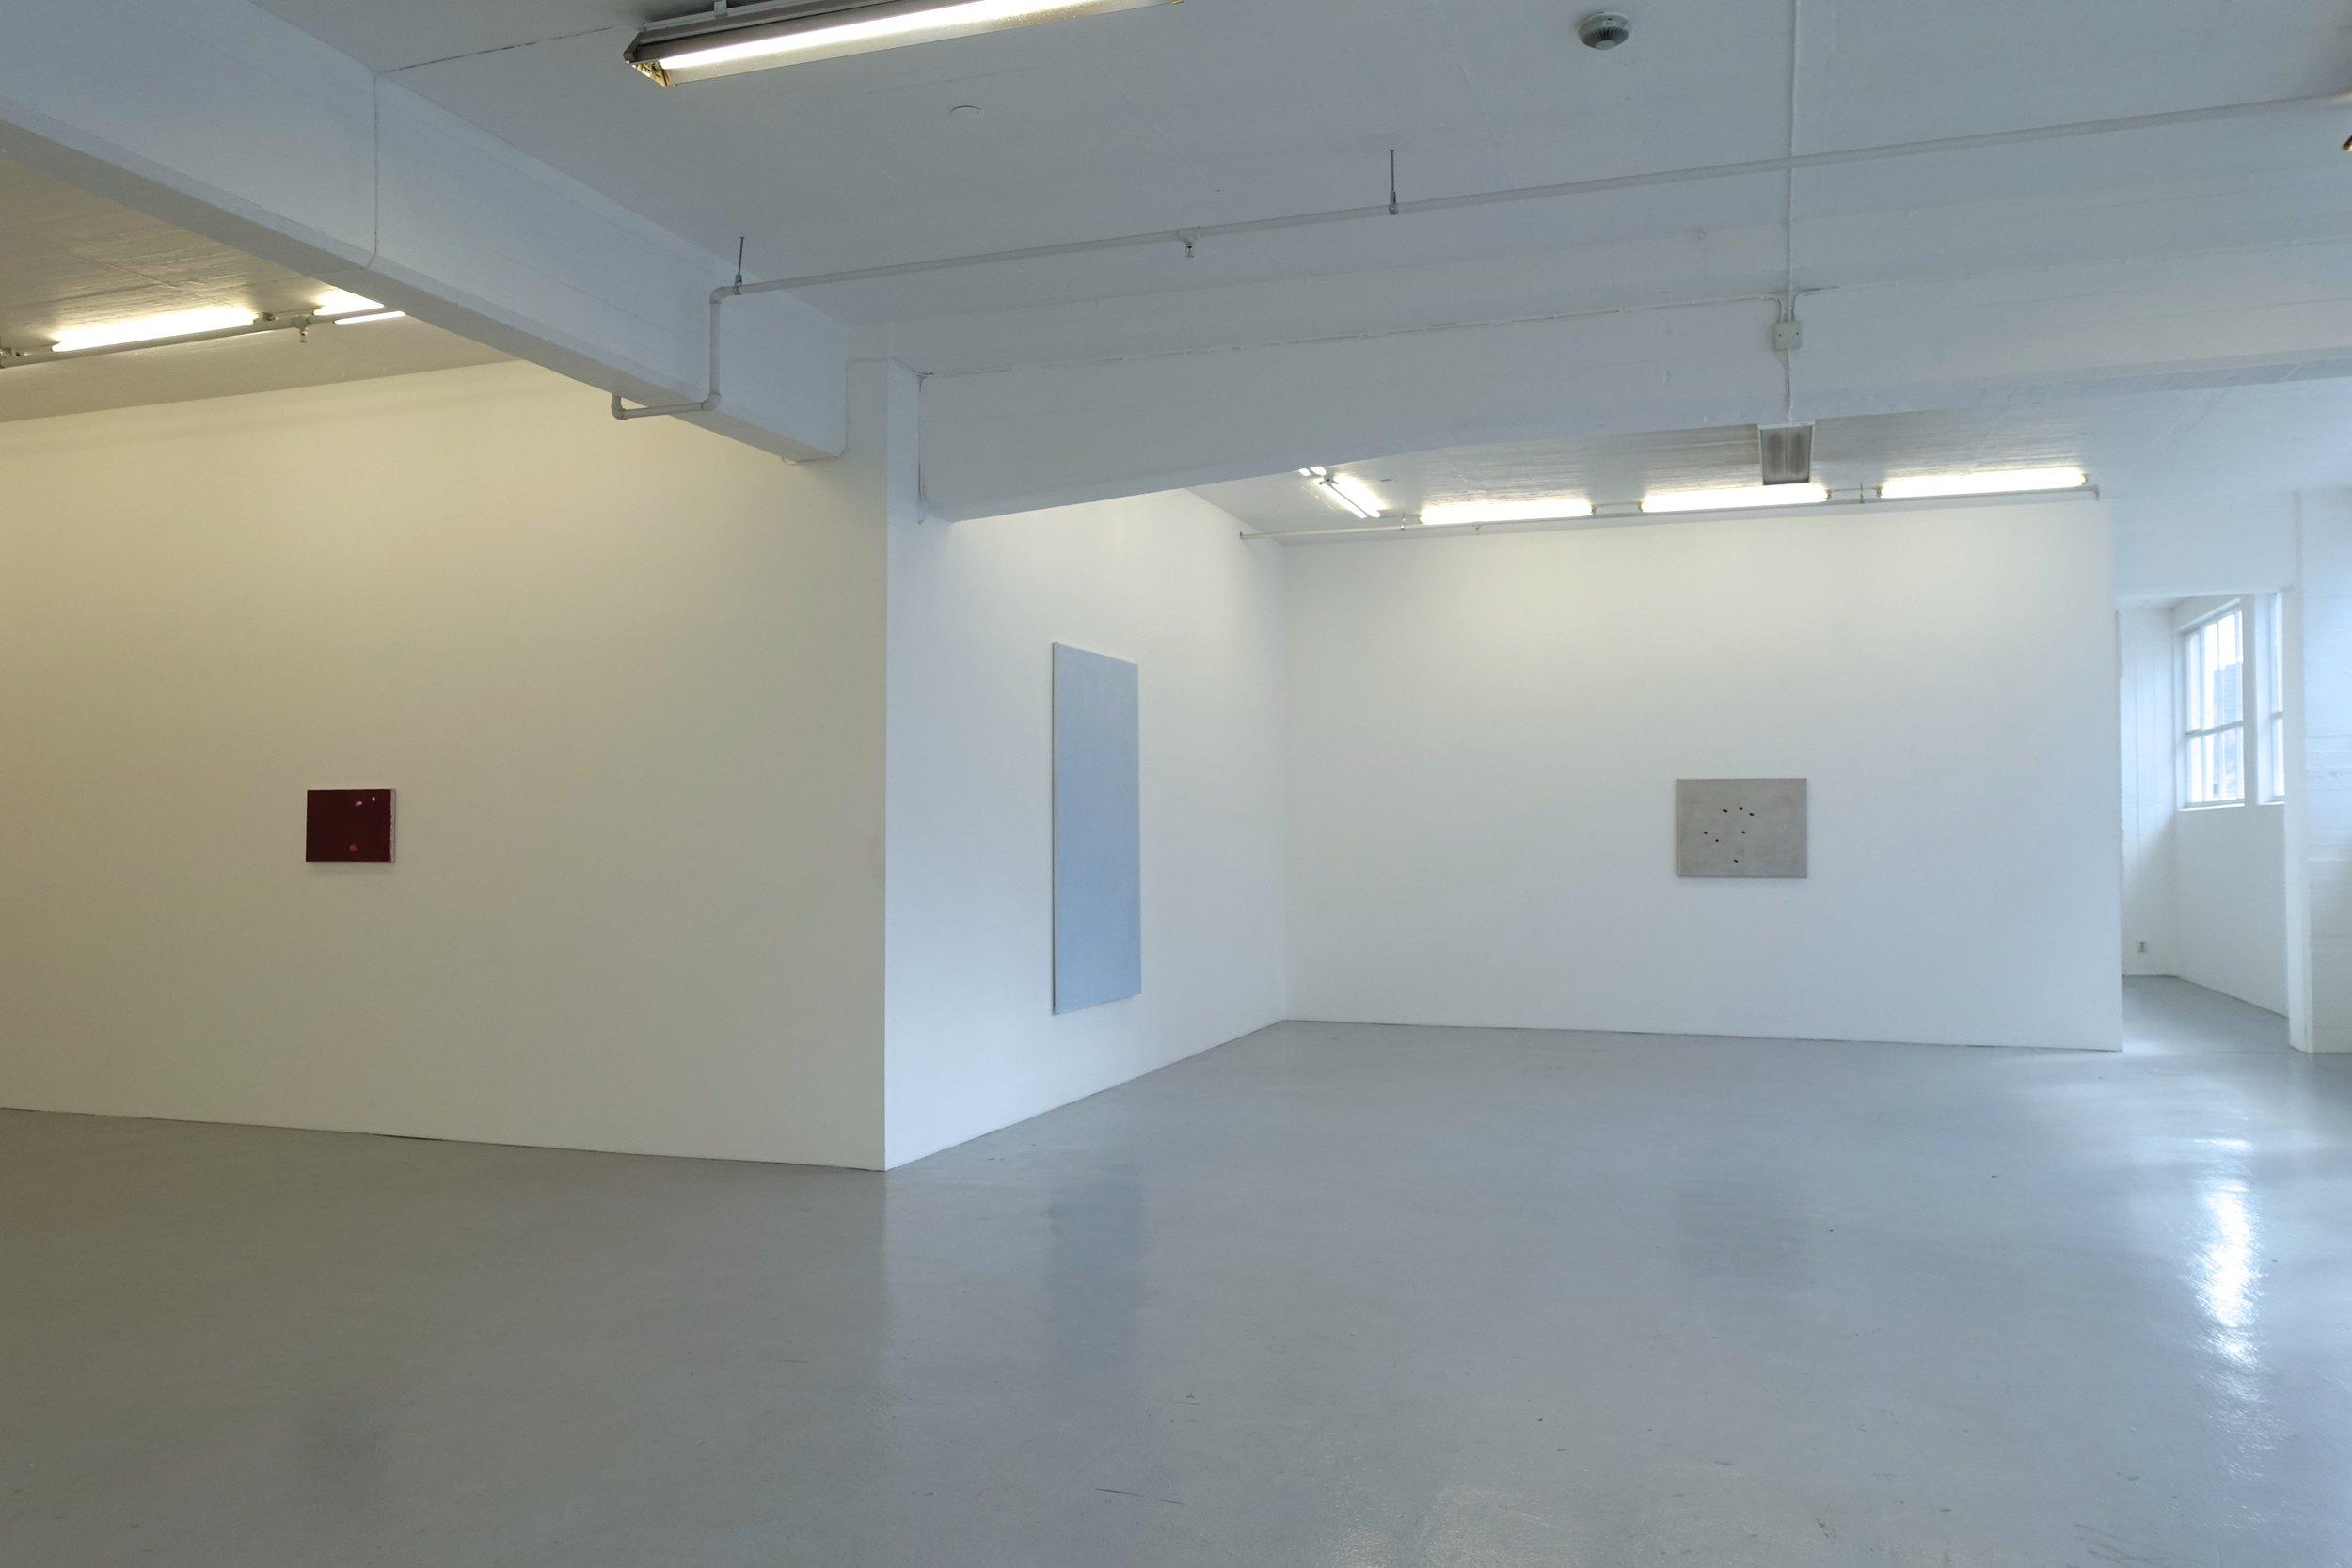 Installasjonsfoto (foto: Arnhild Sunnanå)